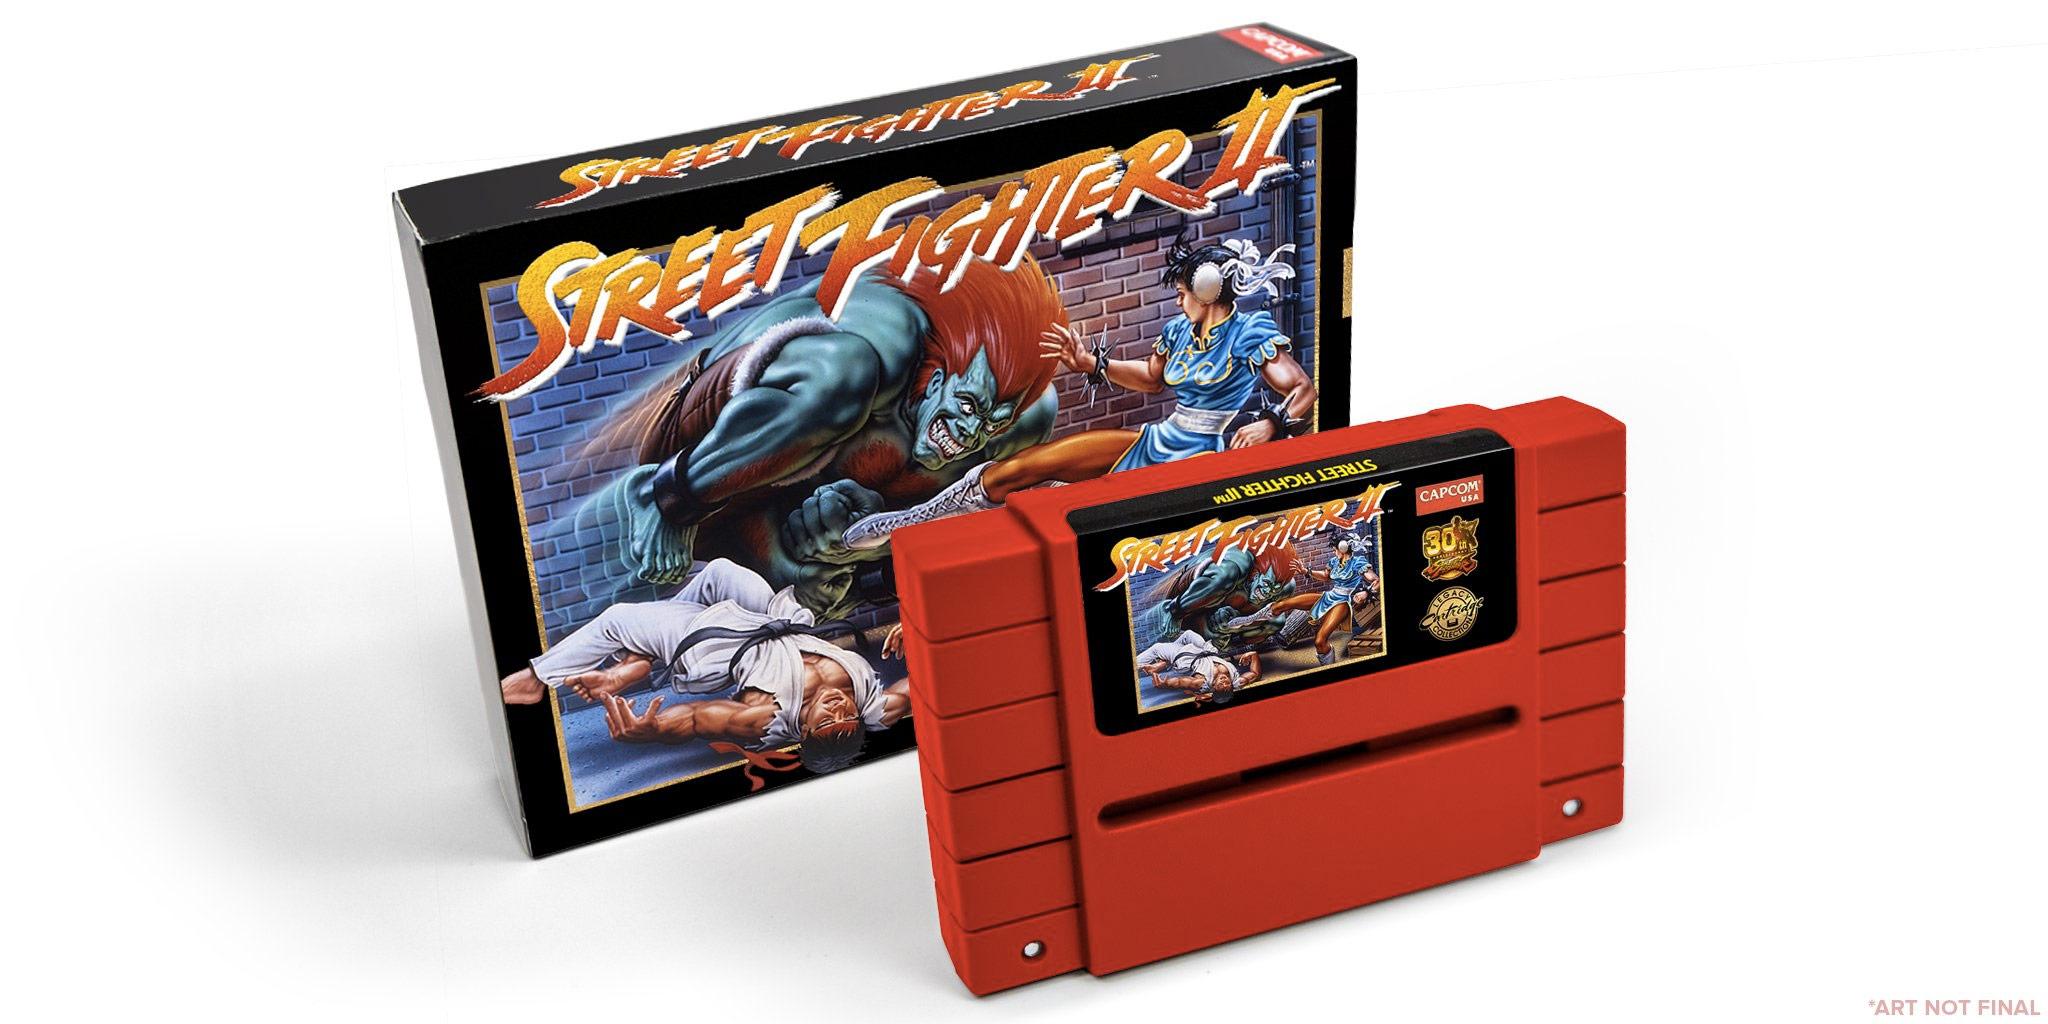 Capcom re-releasing Street Fighter 2 on SNES cartridge